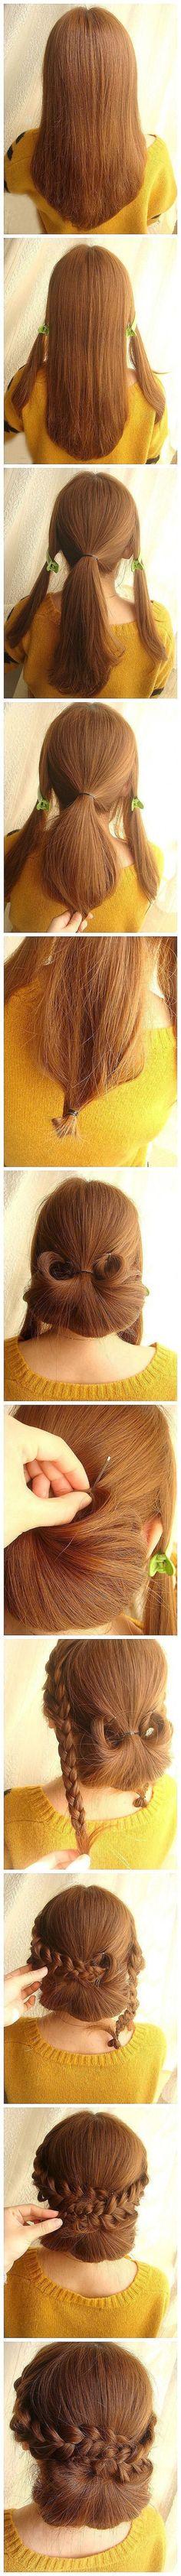 1860s hair tutorial